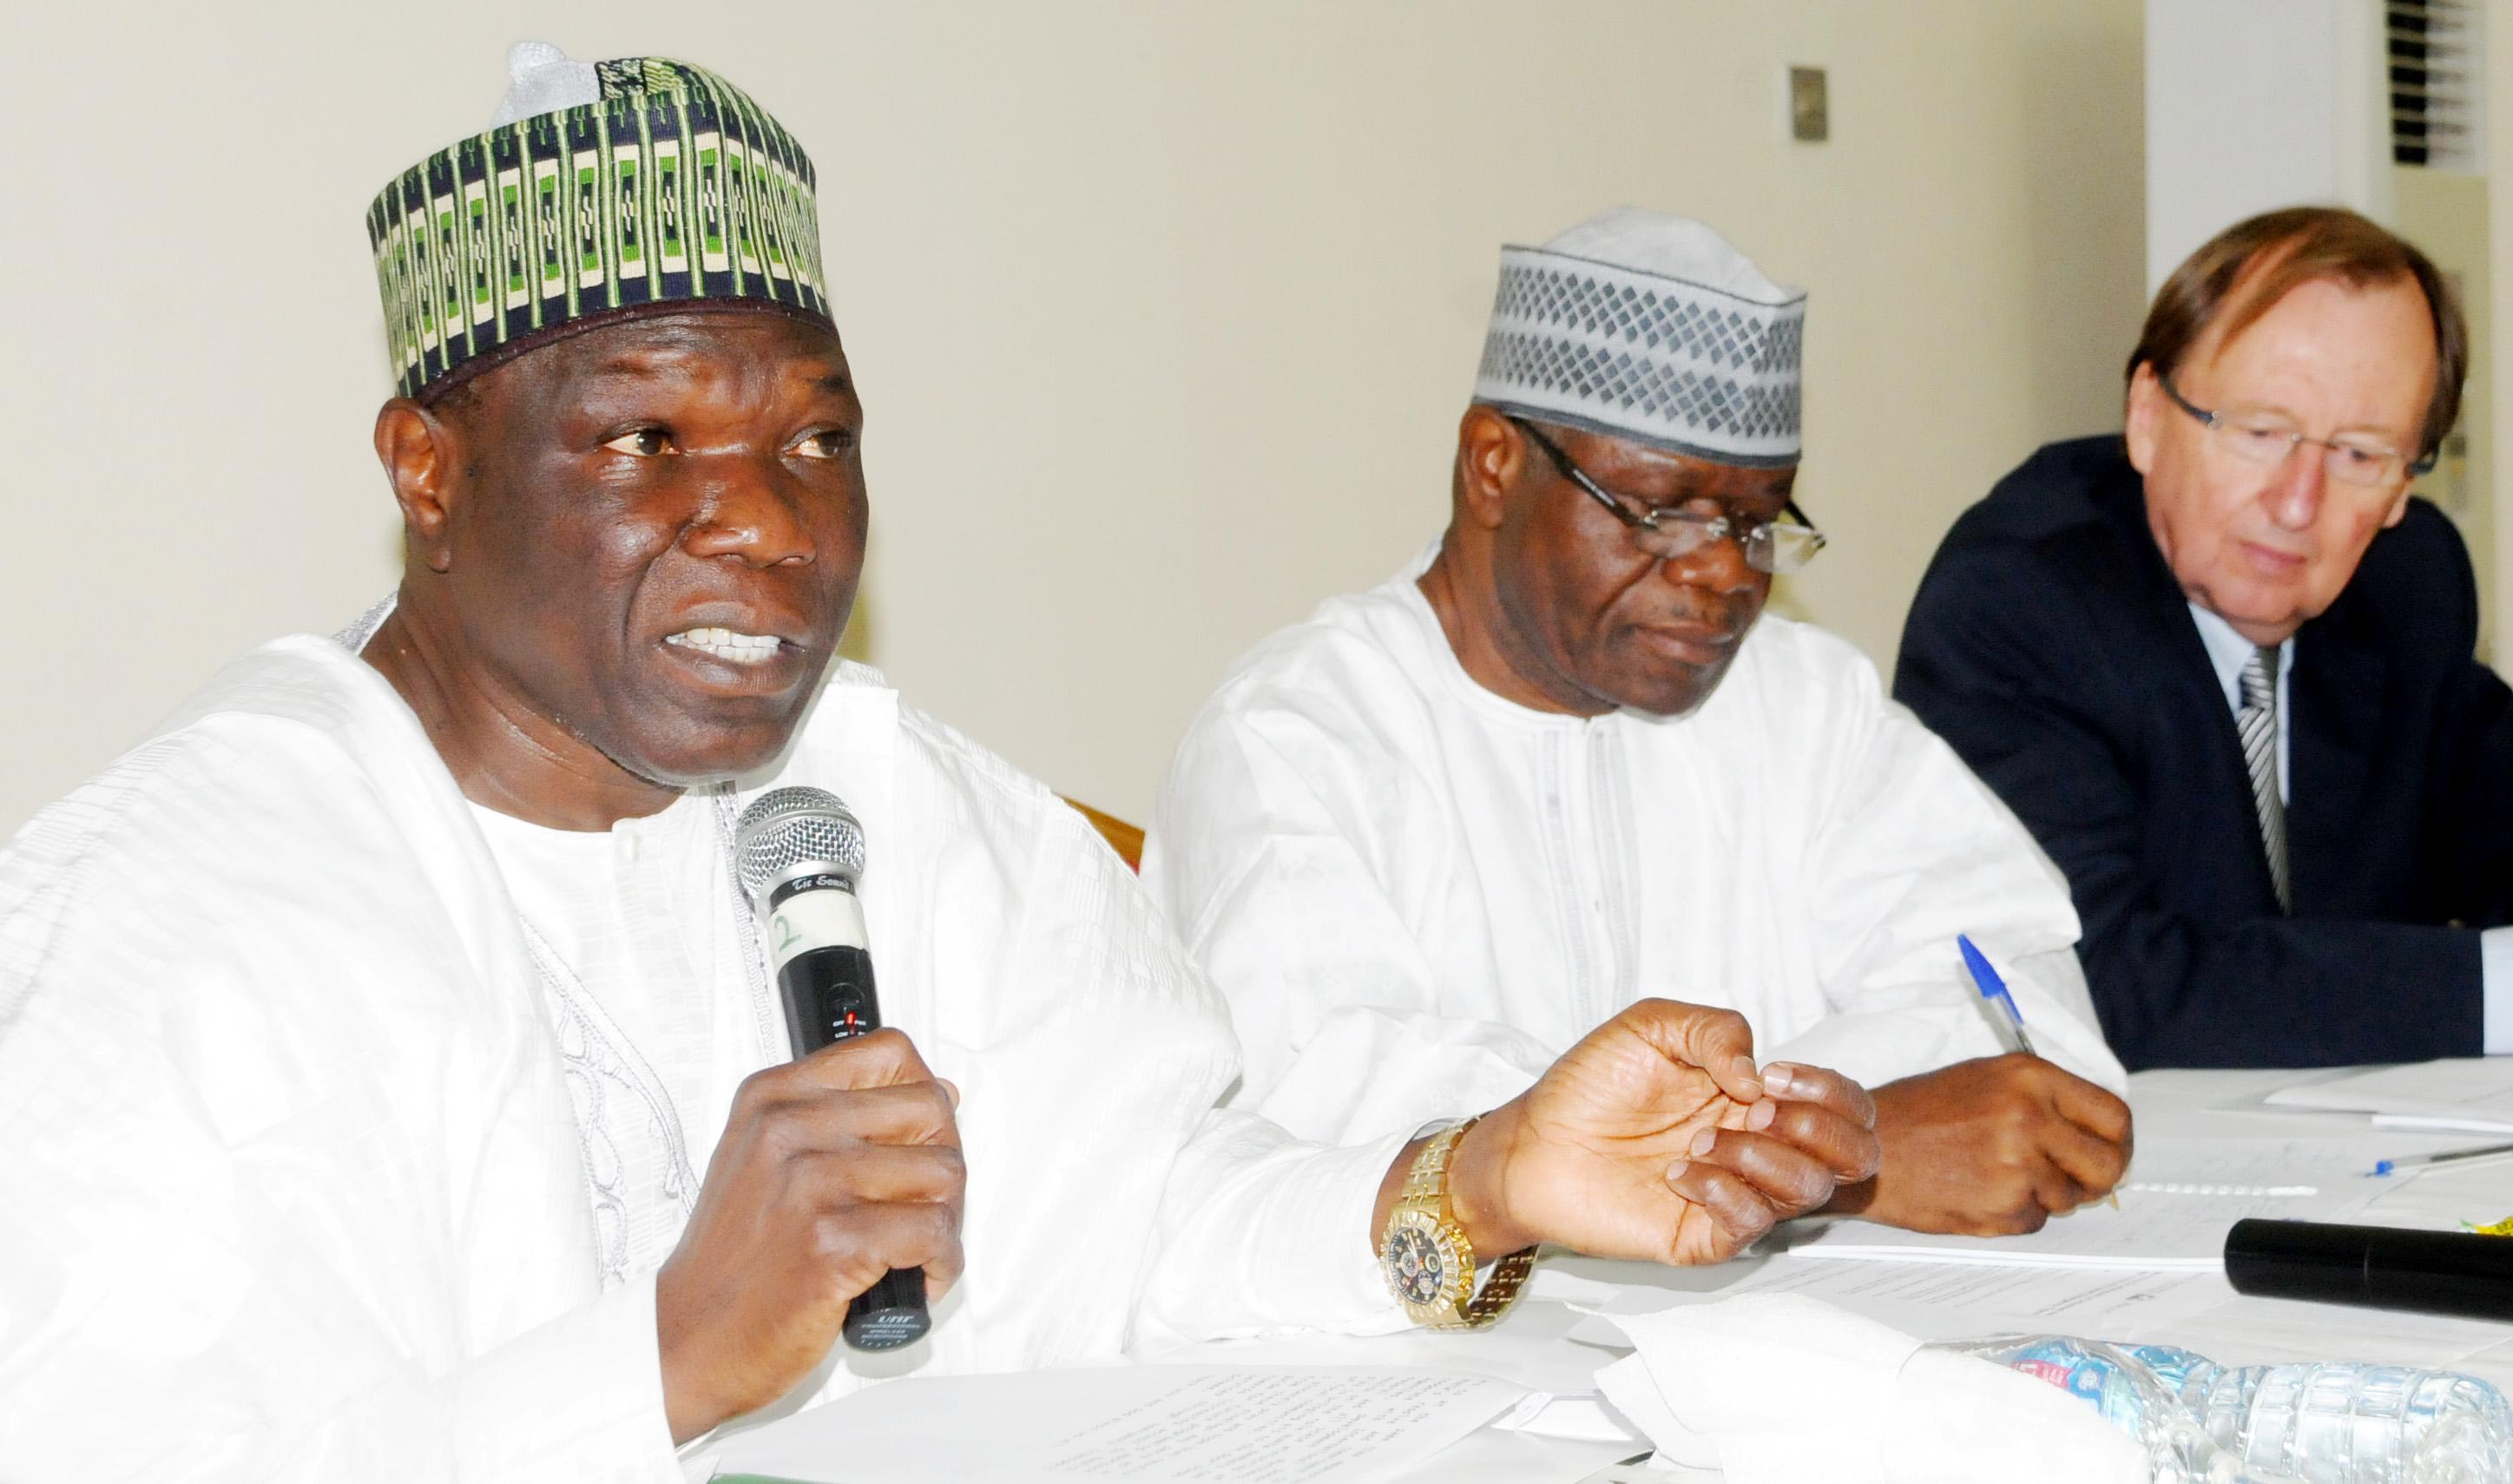 NURTW chairman urges members to shun political thuggery